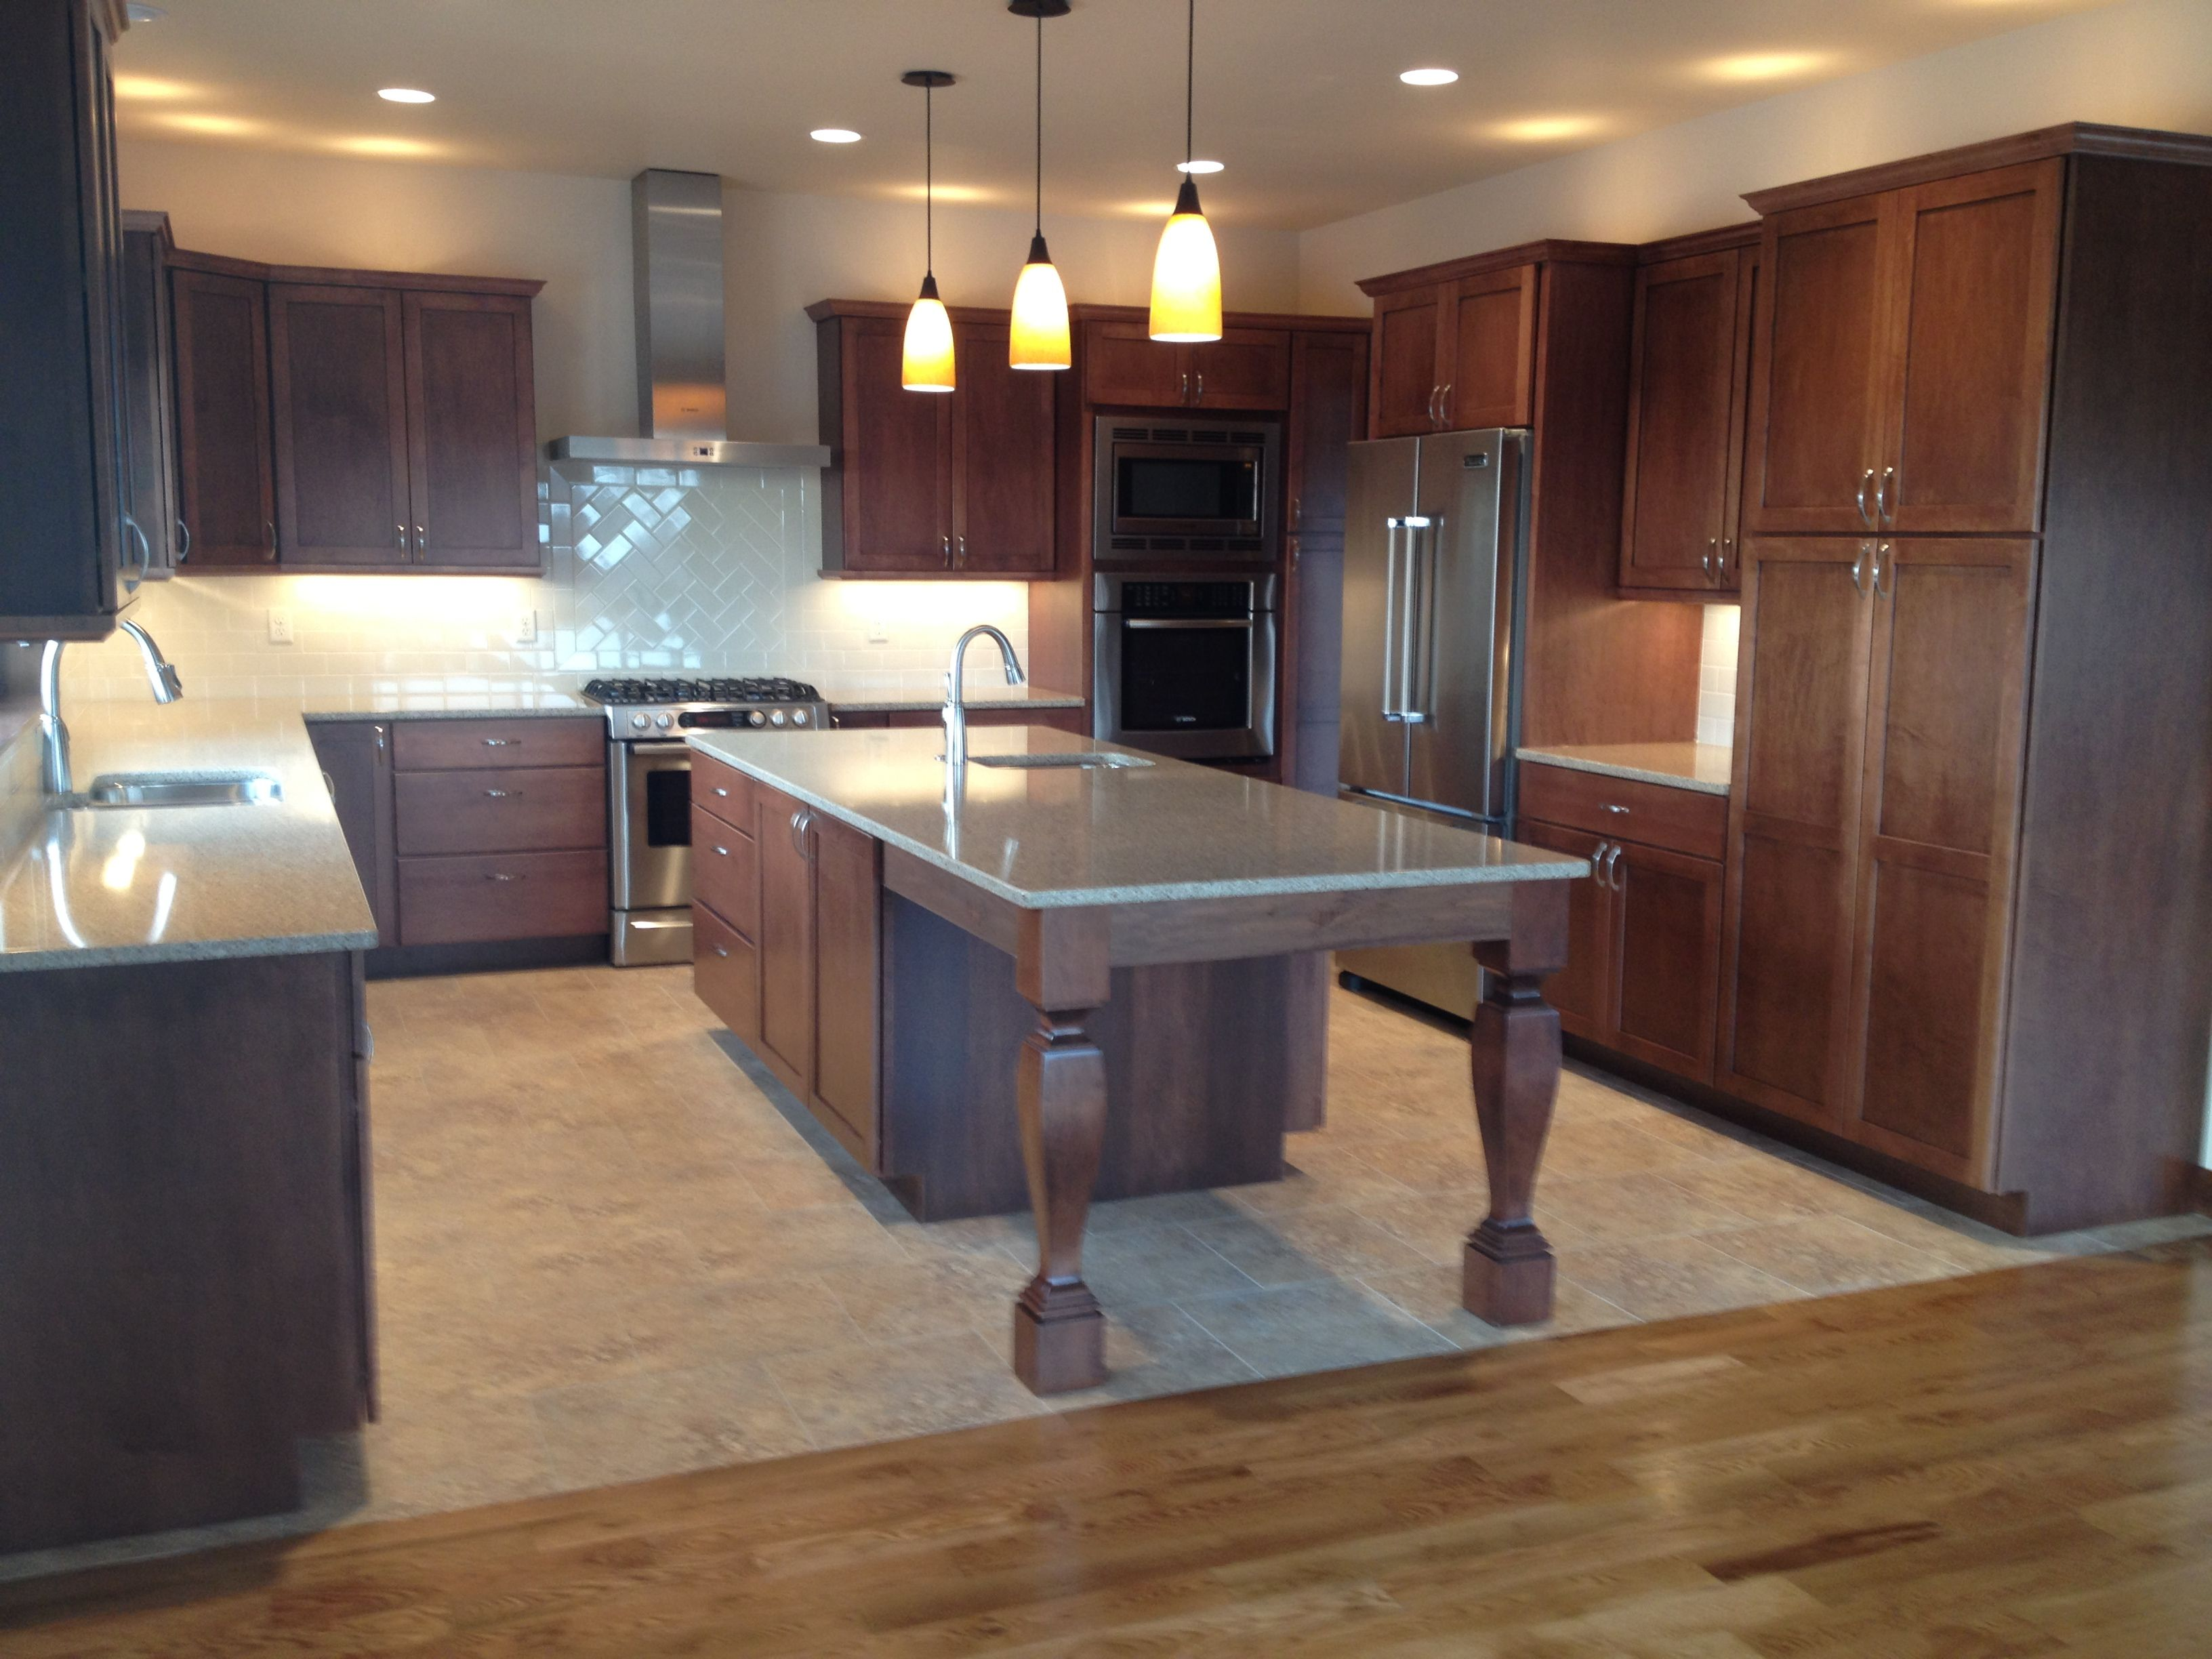 Gerard Homes Stained Red Oak Hardwood Flooring Meeting Up